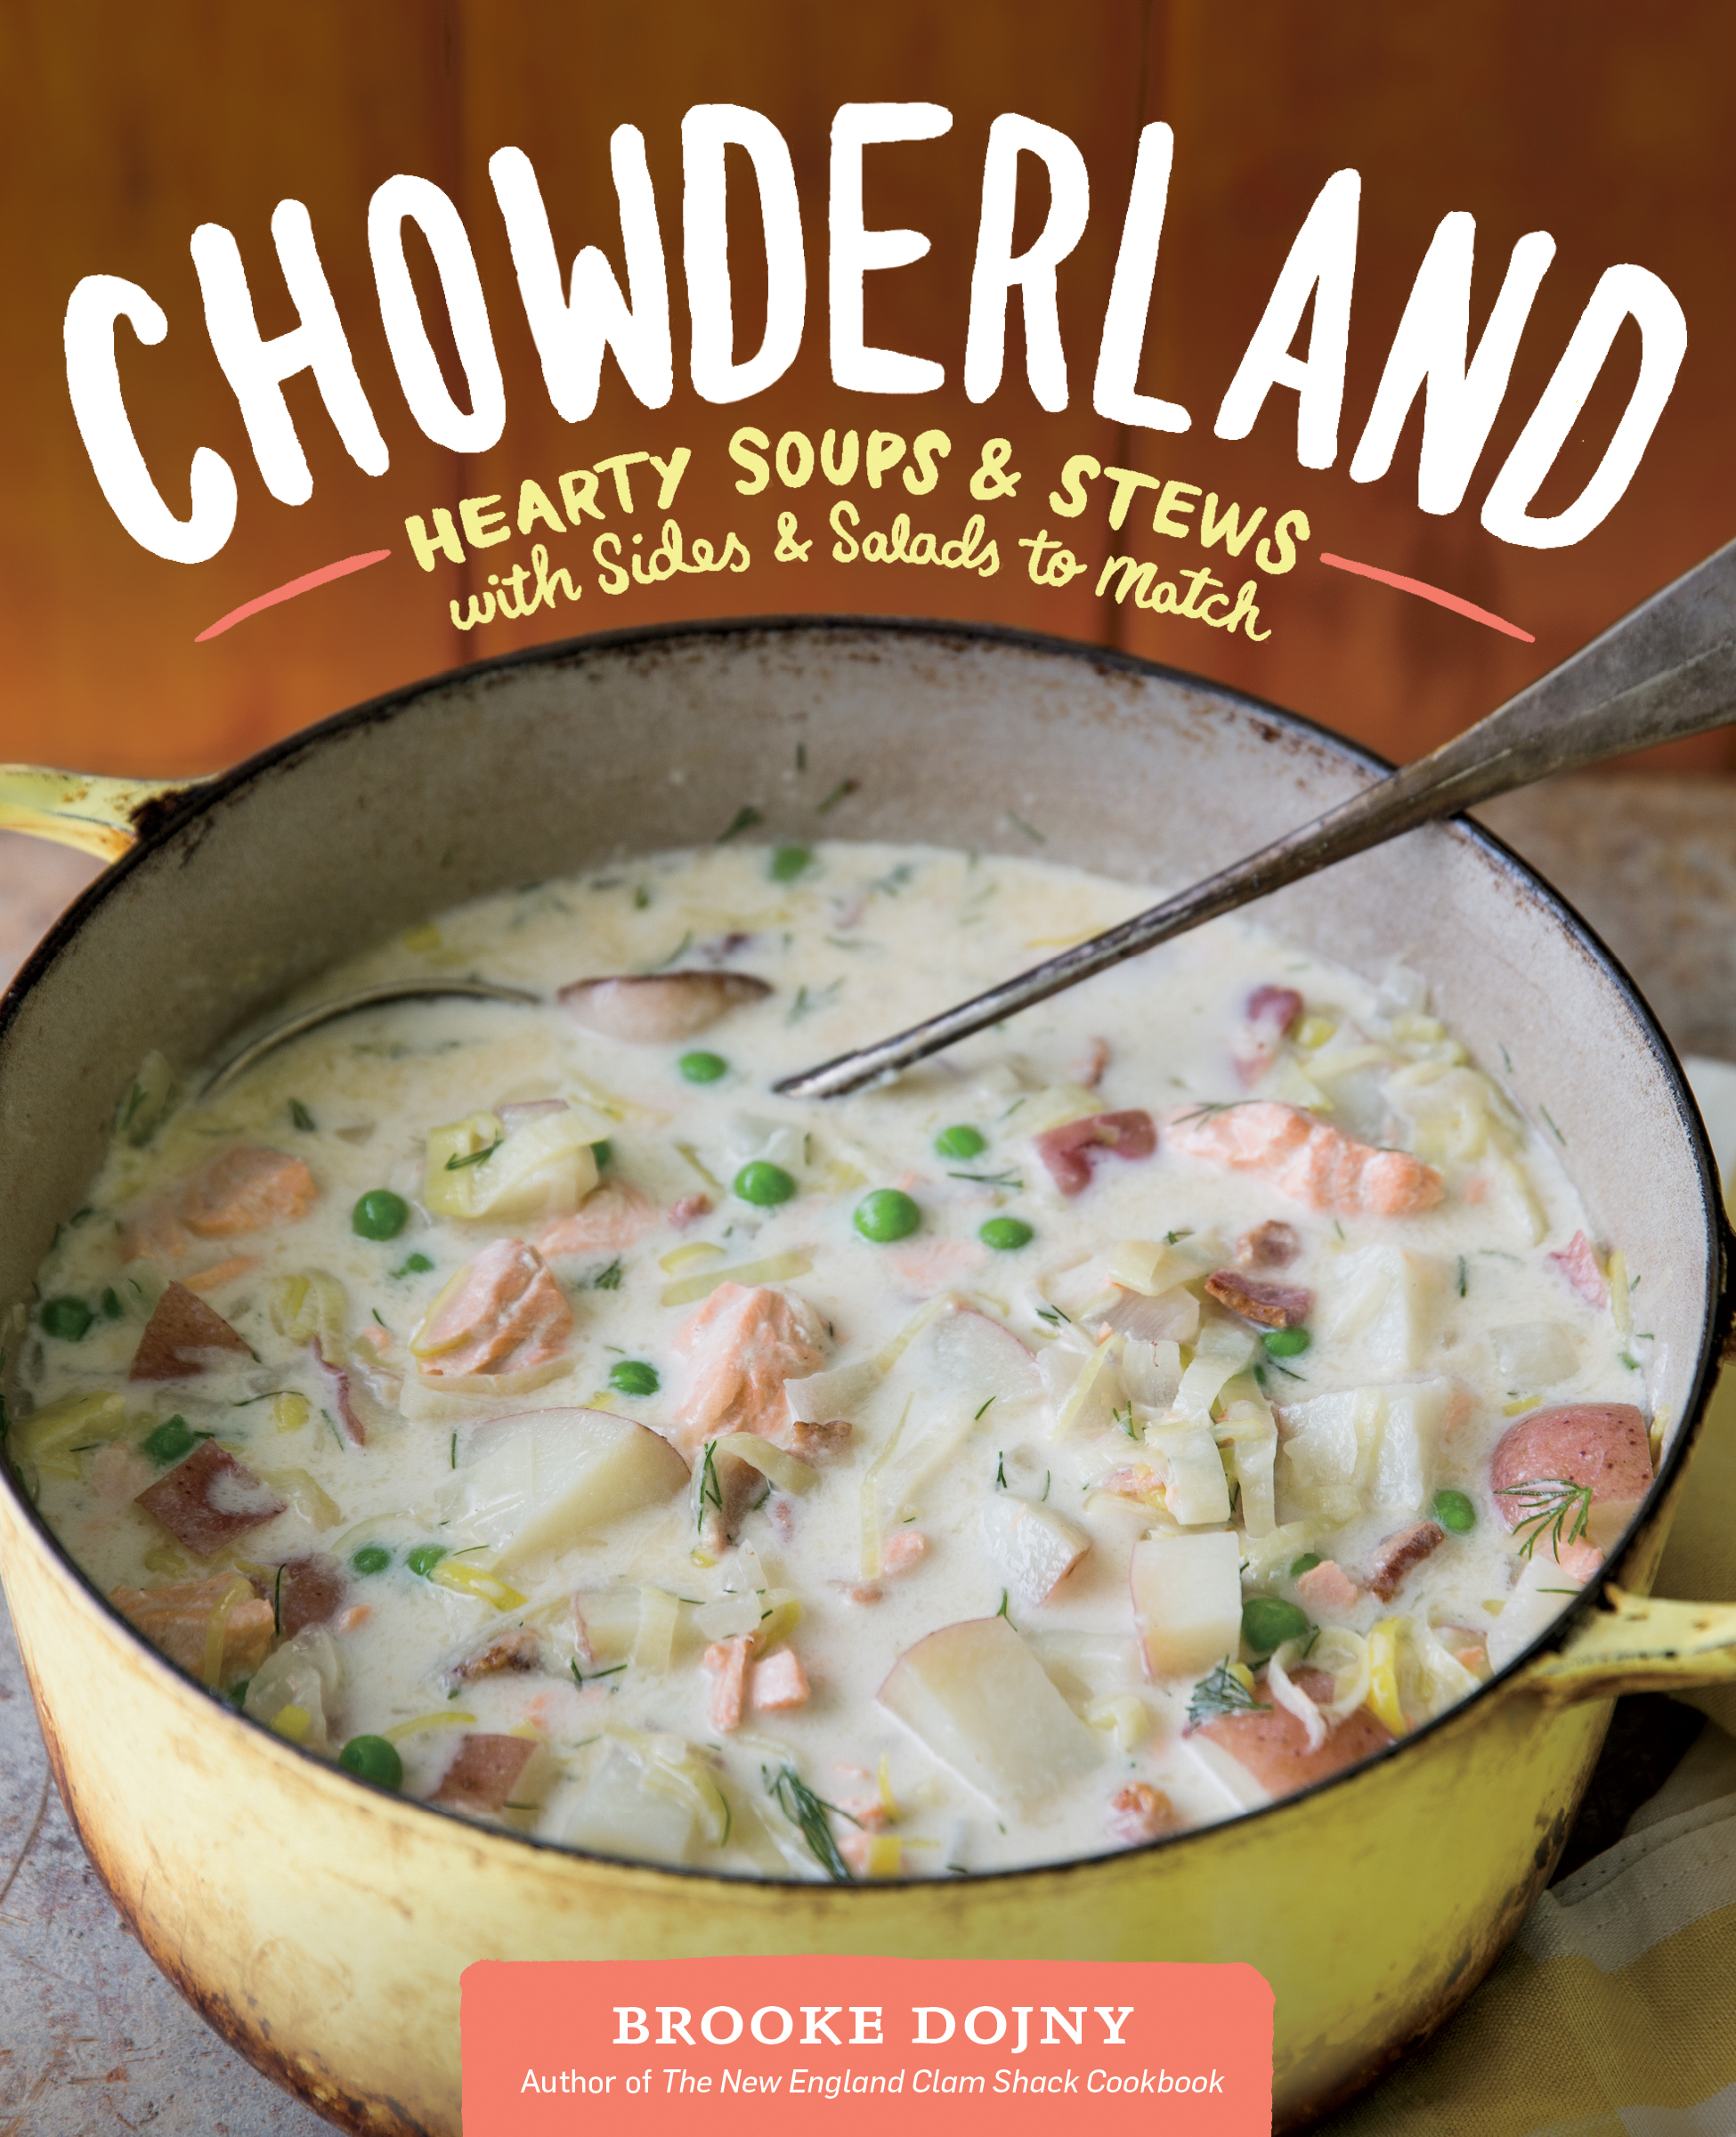 Chowderland Hearty Soups & Stews with Sides & Salads to Match - Brooke Dojny